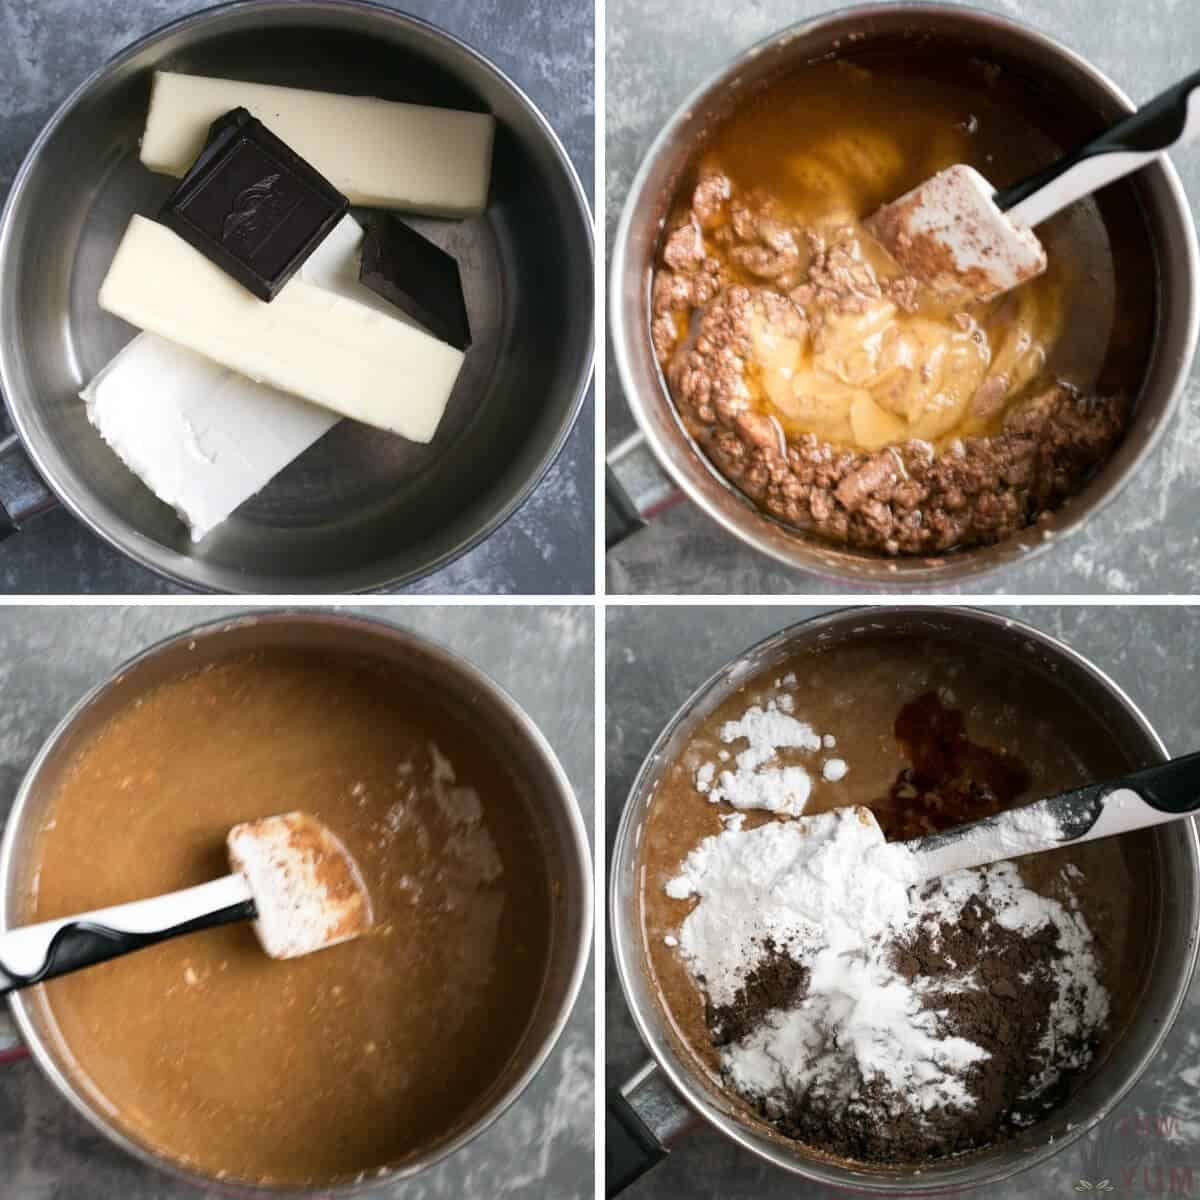 dark chocolate keto fudge ingredients in pot